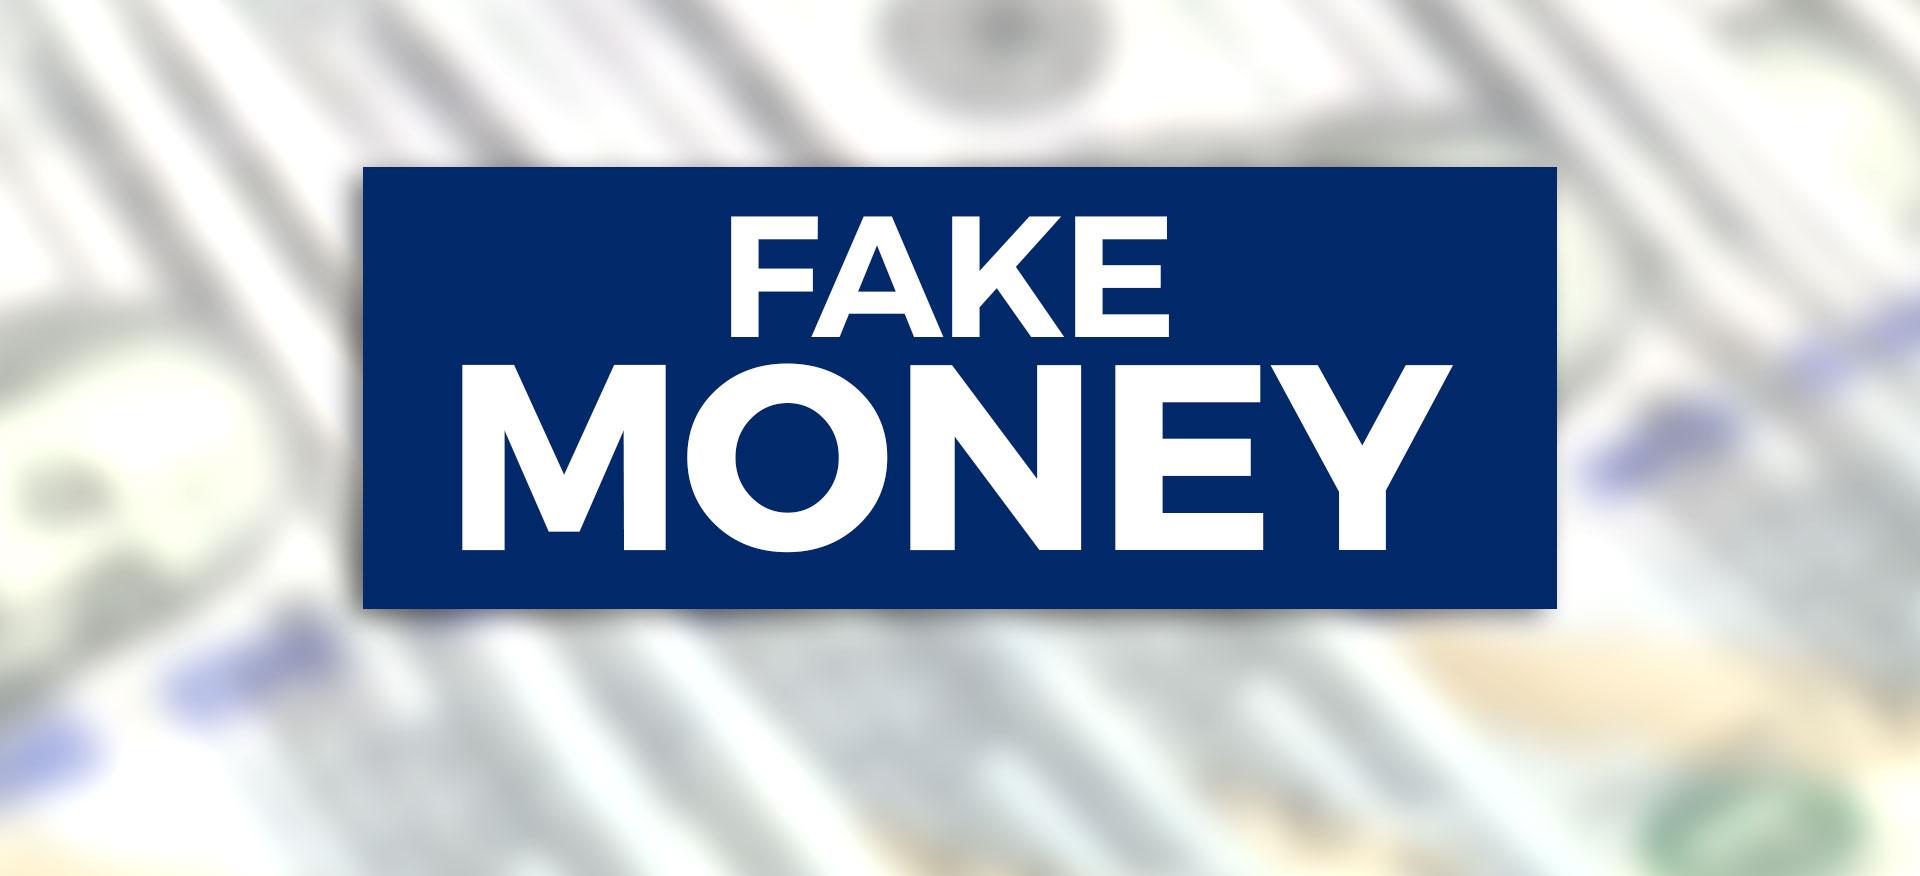 Funny Money Fake Money Counterfeit Money Counterfeit Cash Funny Cash Fake Cash